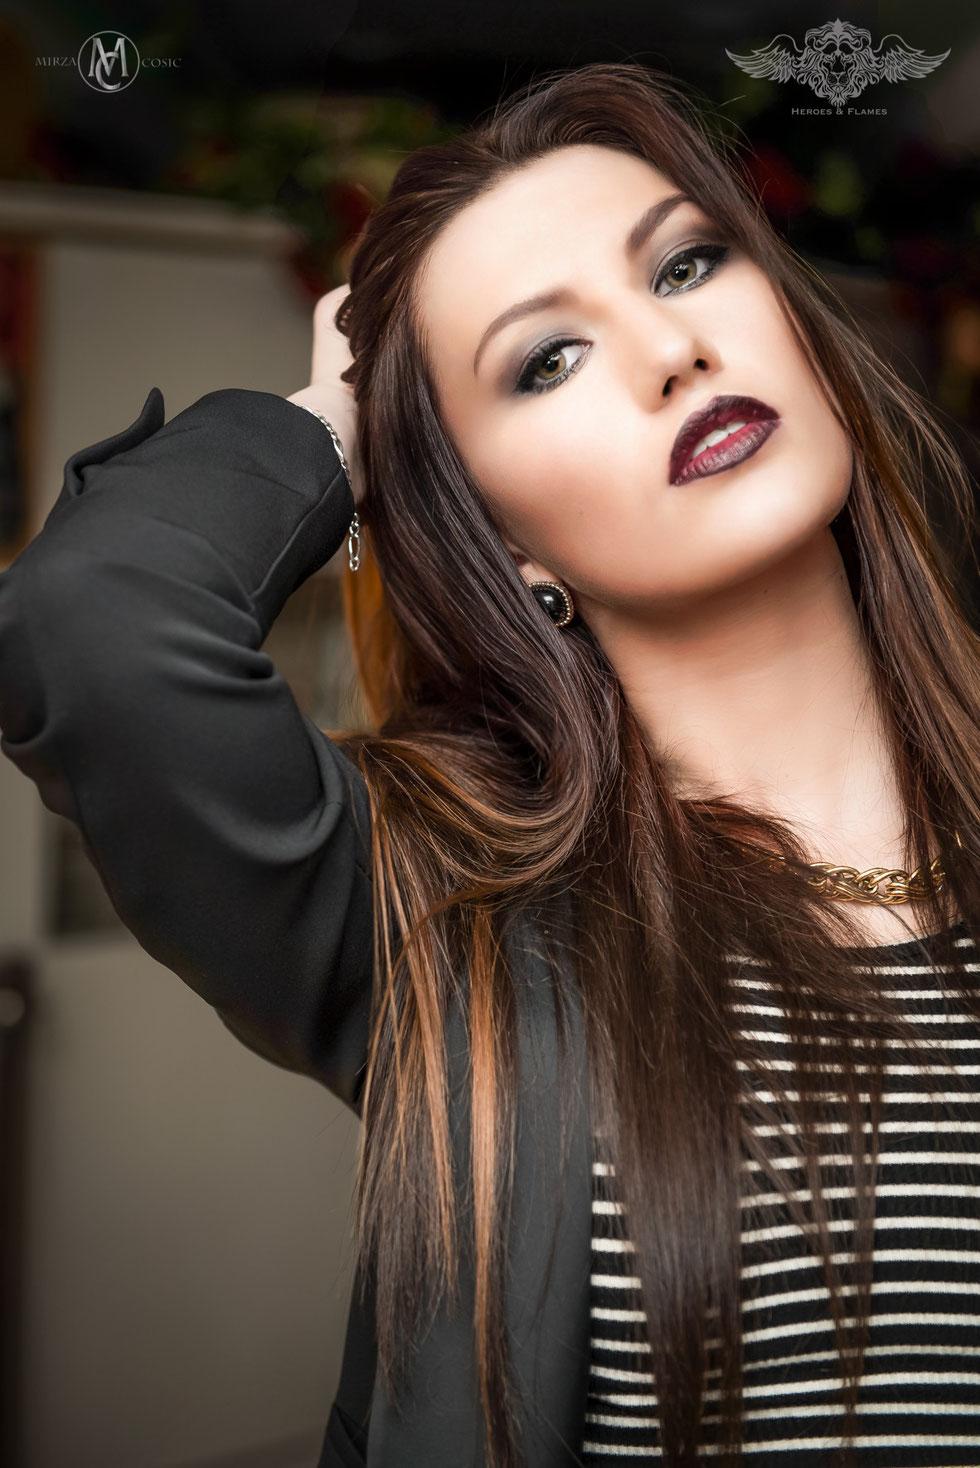 © Mirza Cosic   Model: Andrea.Queeni